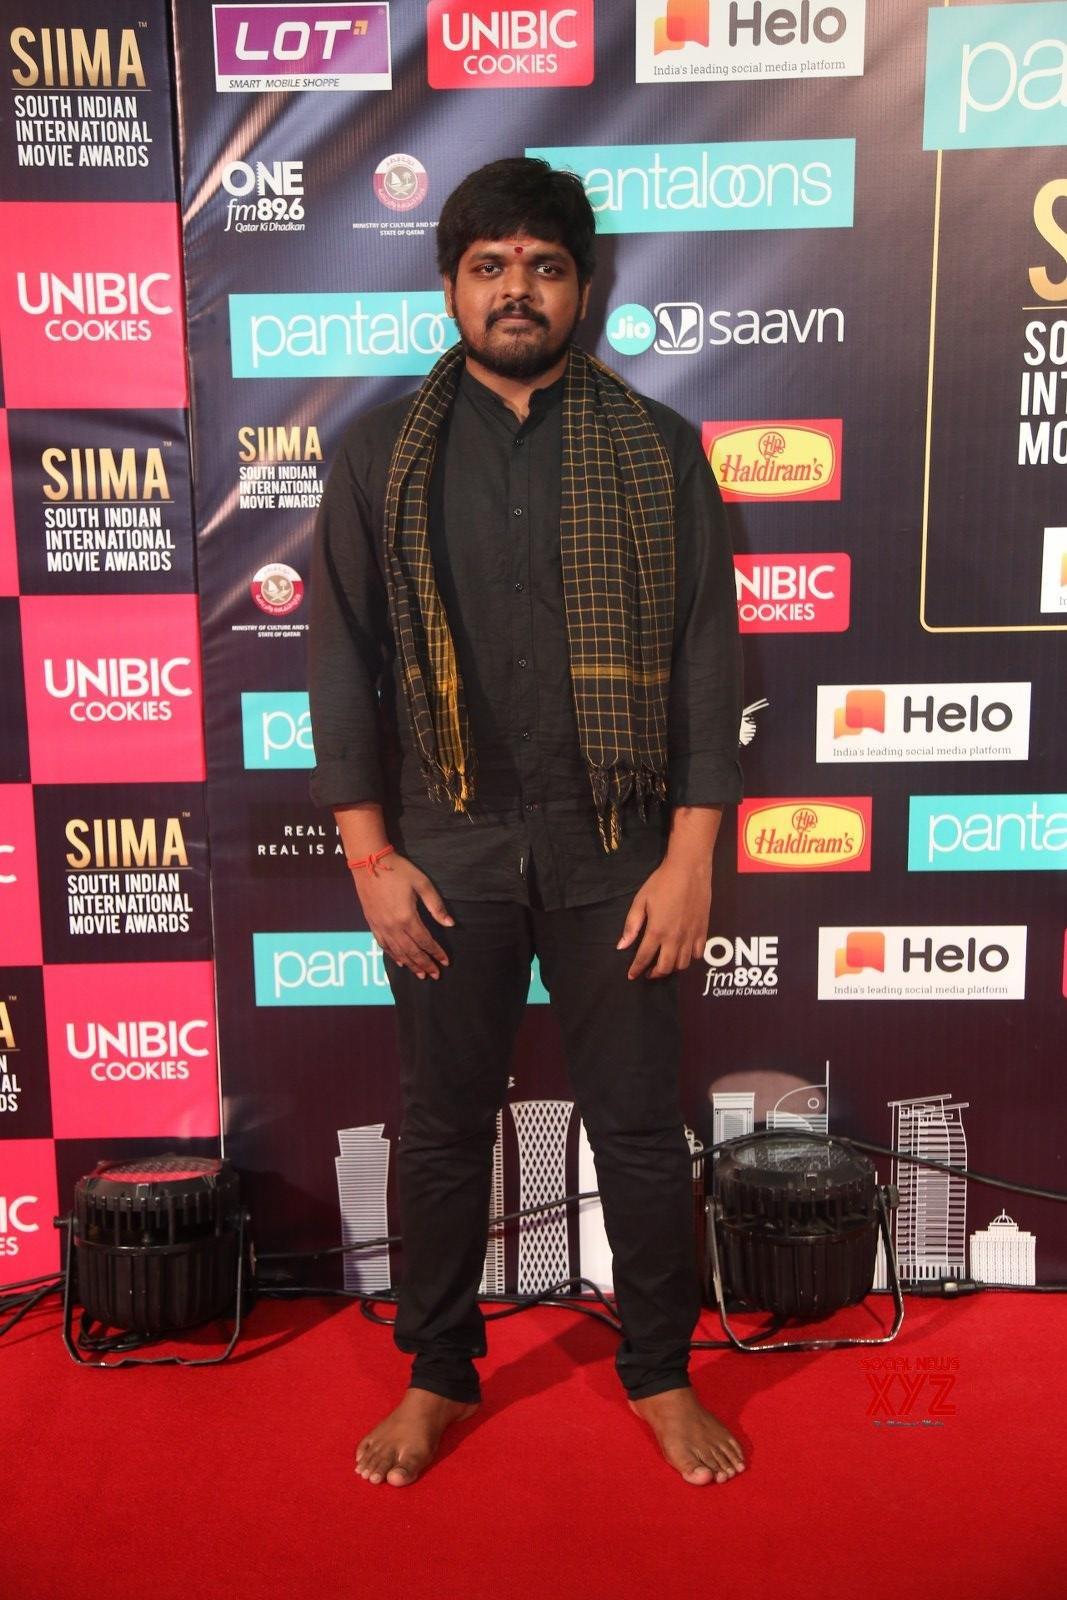 Celebs At SIIMA Awards 2019 Red Carpet In Doha Qatar Gallery Set 1